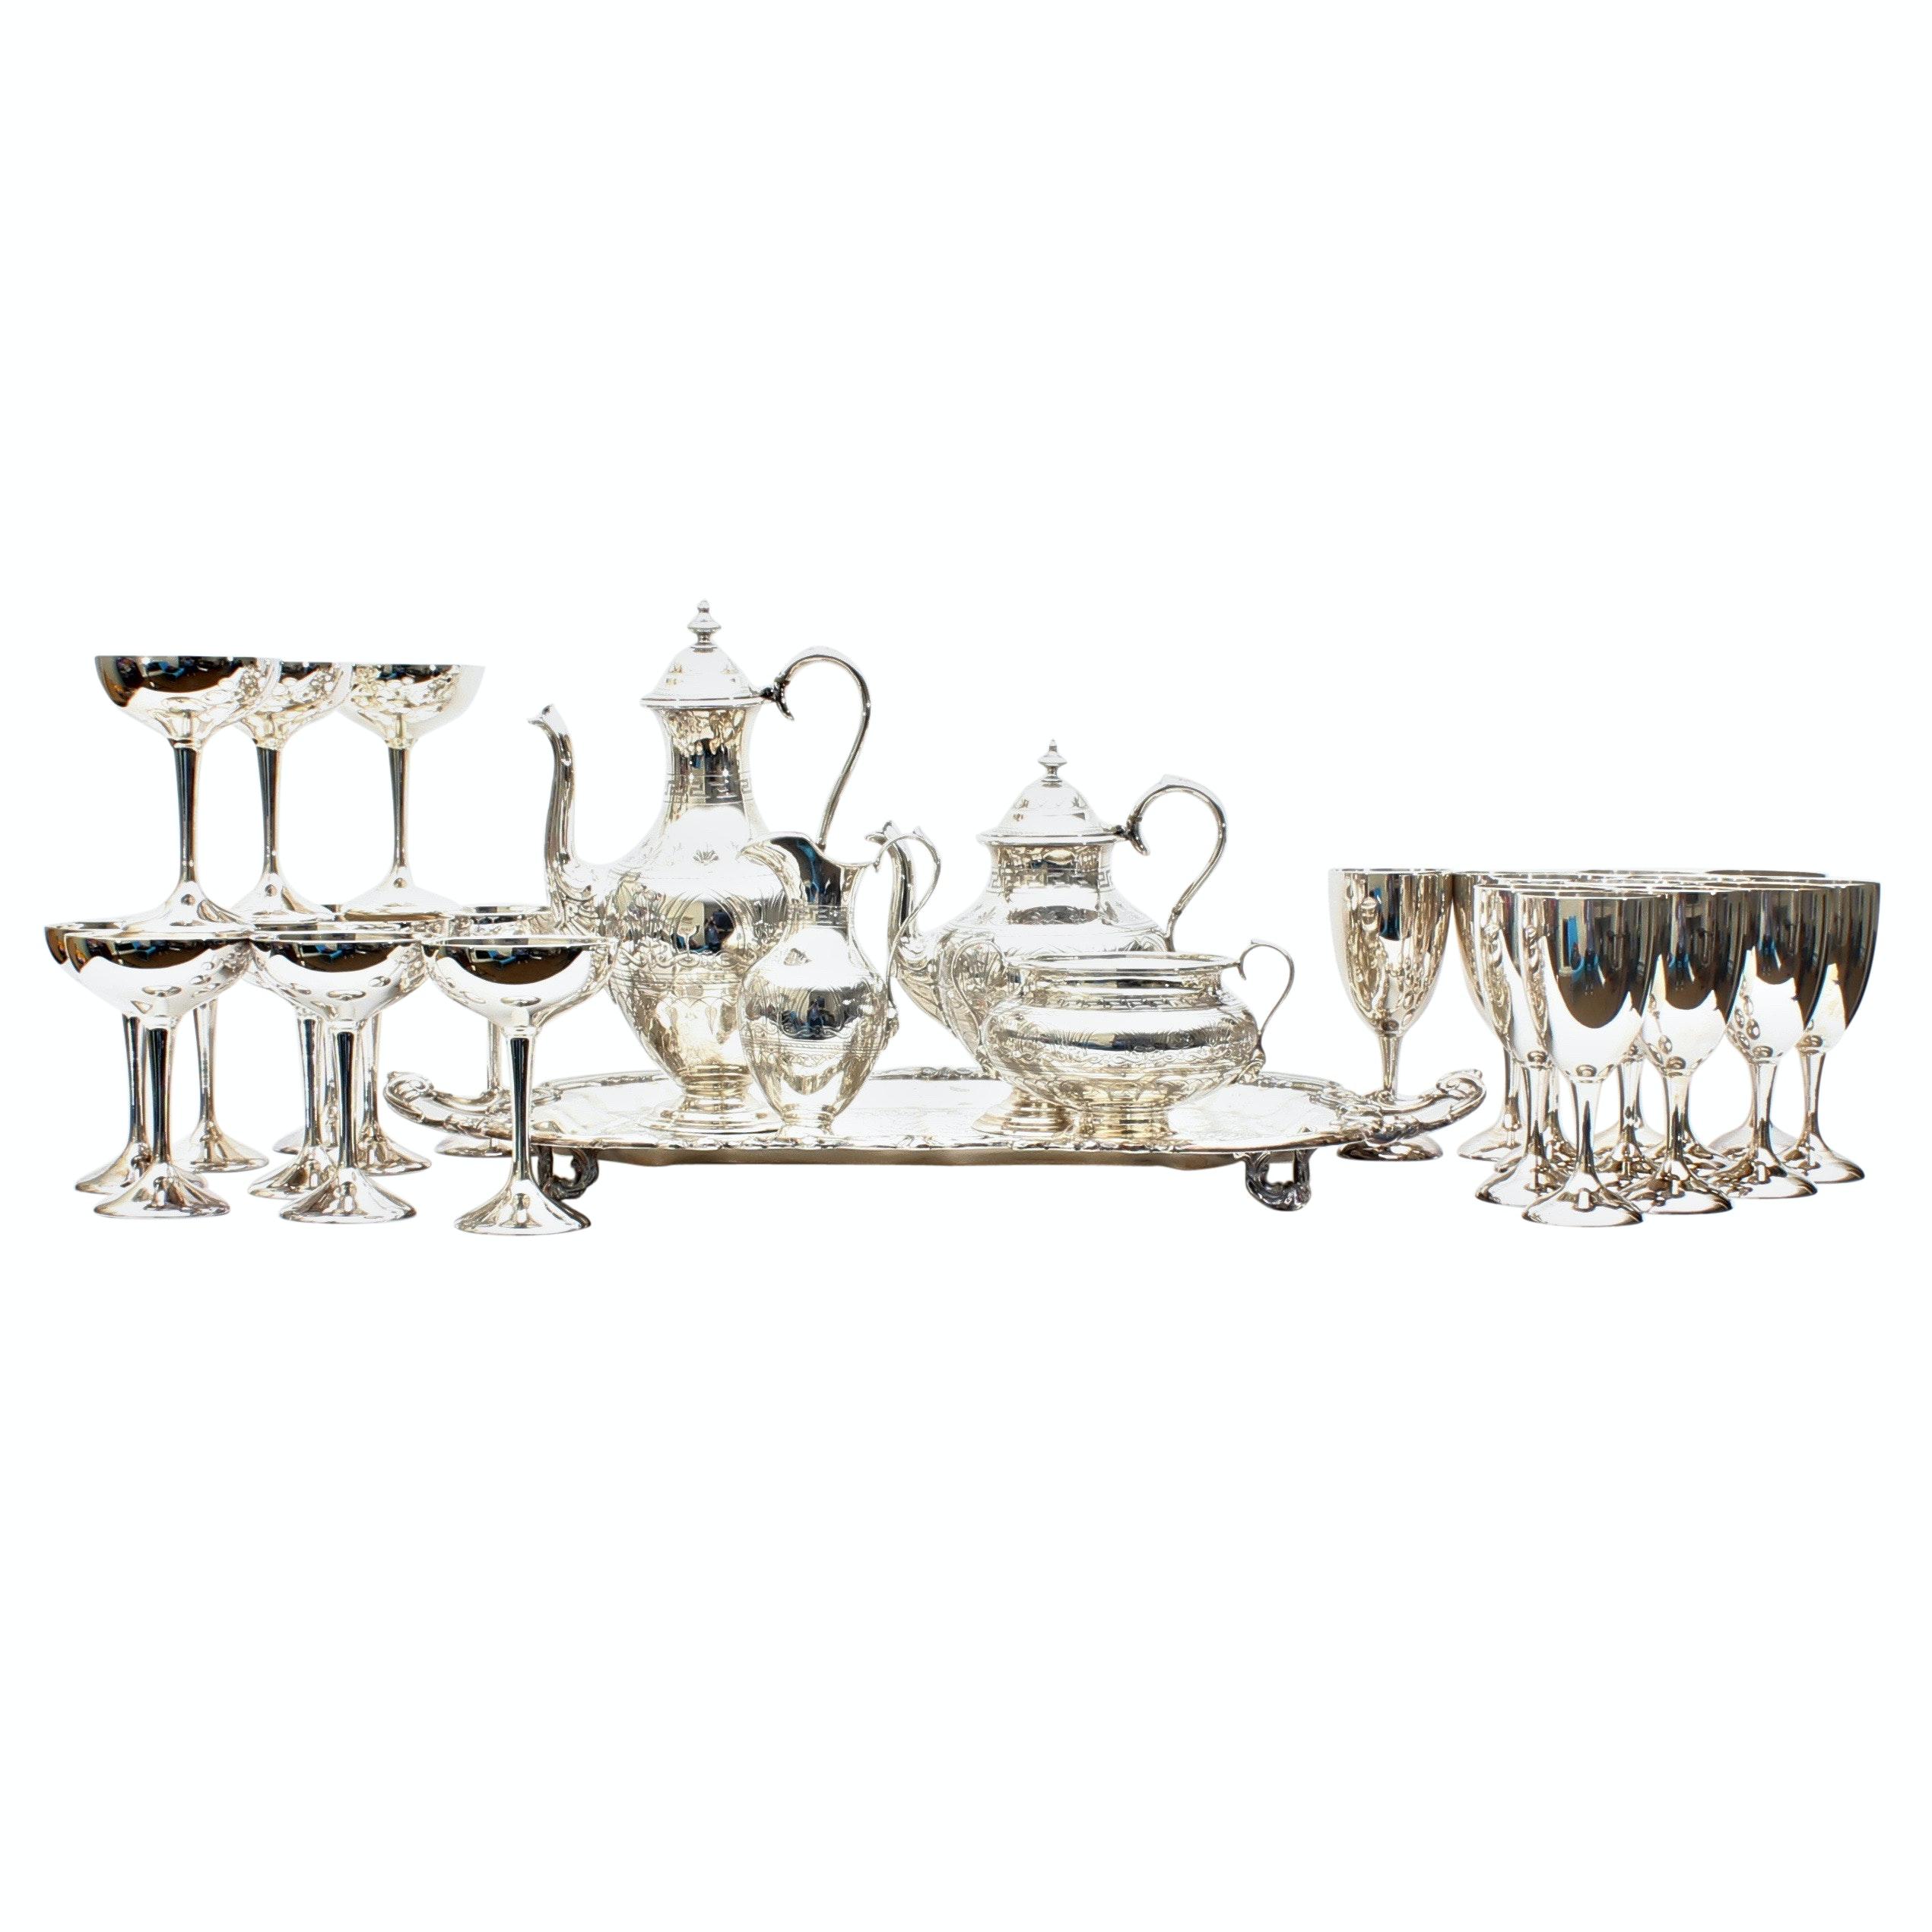 Silver Plate Stemware including a Thomas Prime Tea Service